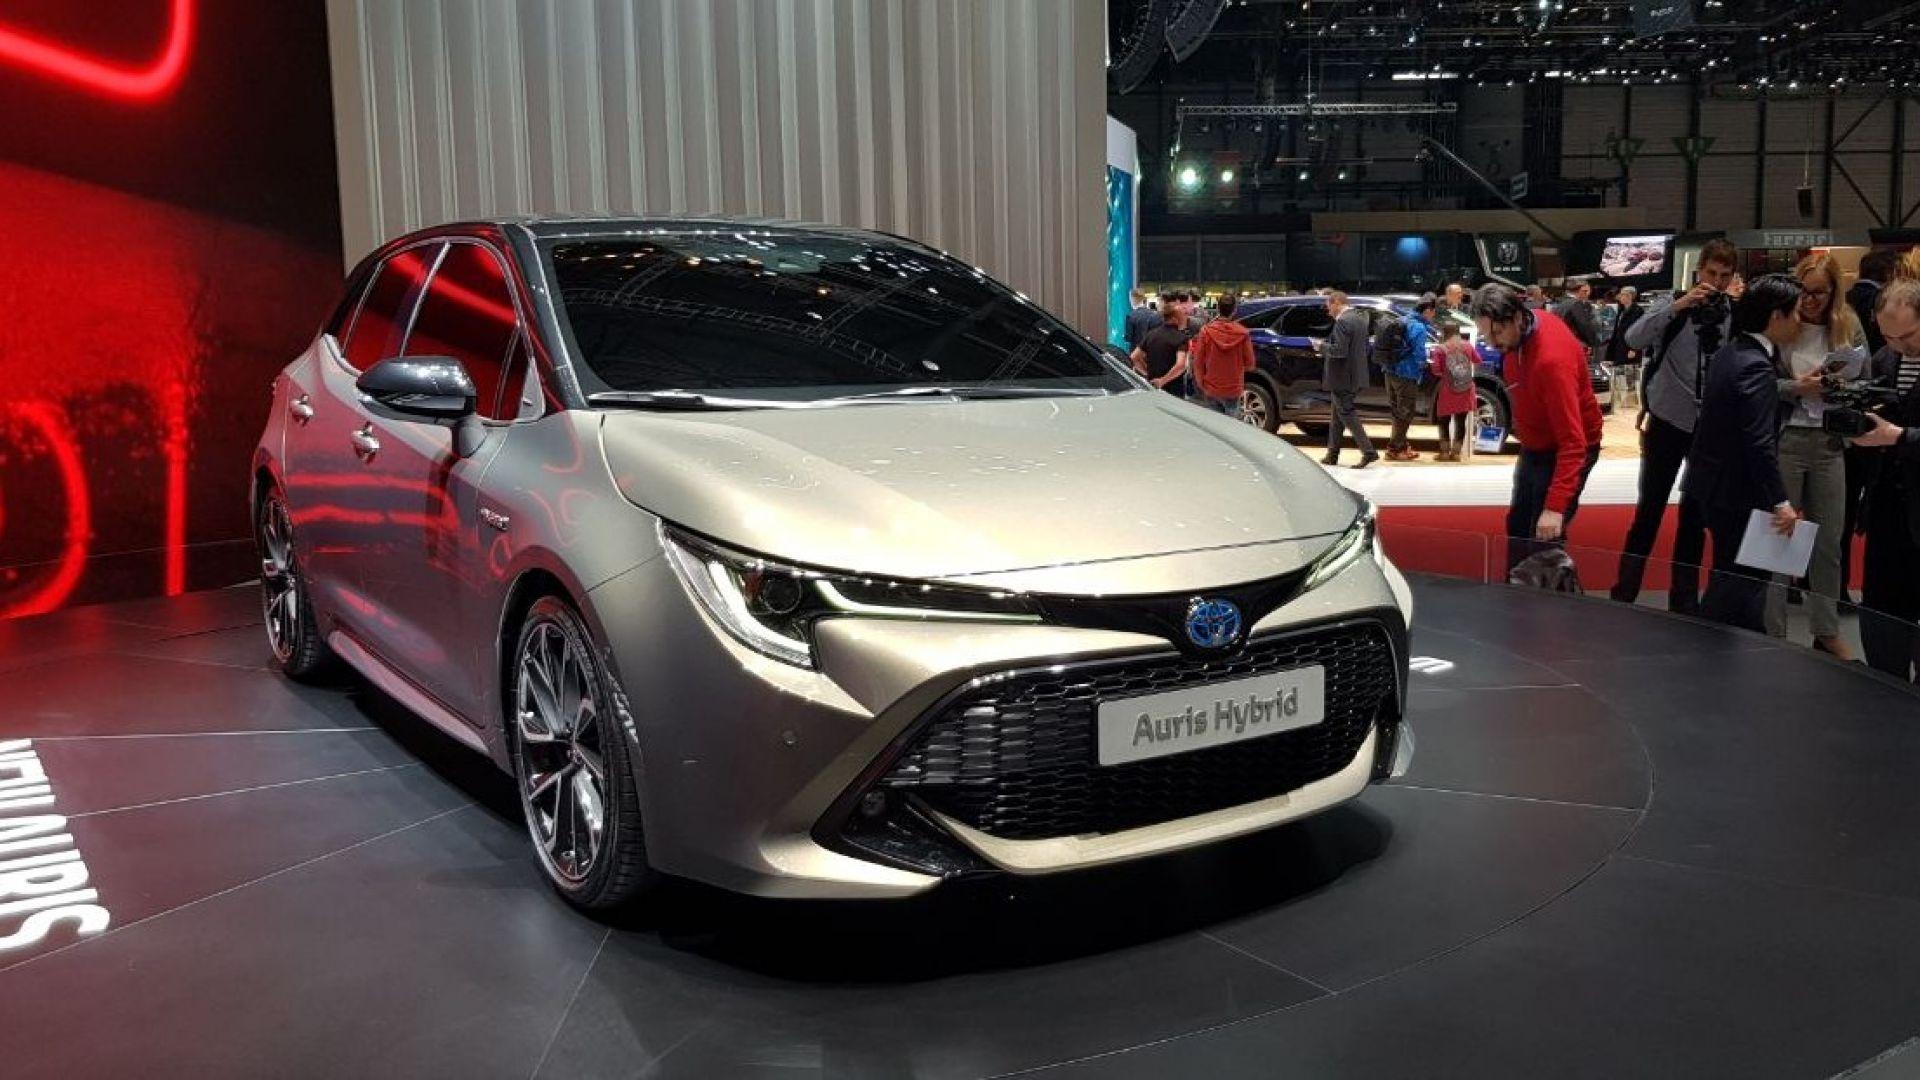 Toyota Supra 2018 >> Salone di Ginevra 2018: le novità Toyota. Nuova Auris, Aygo restyling - MotorBox